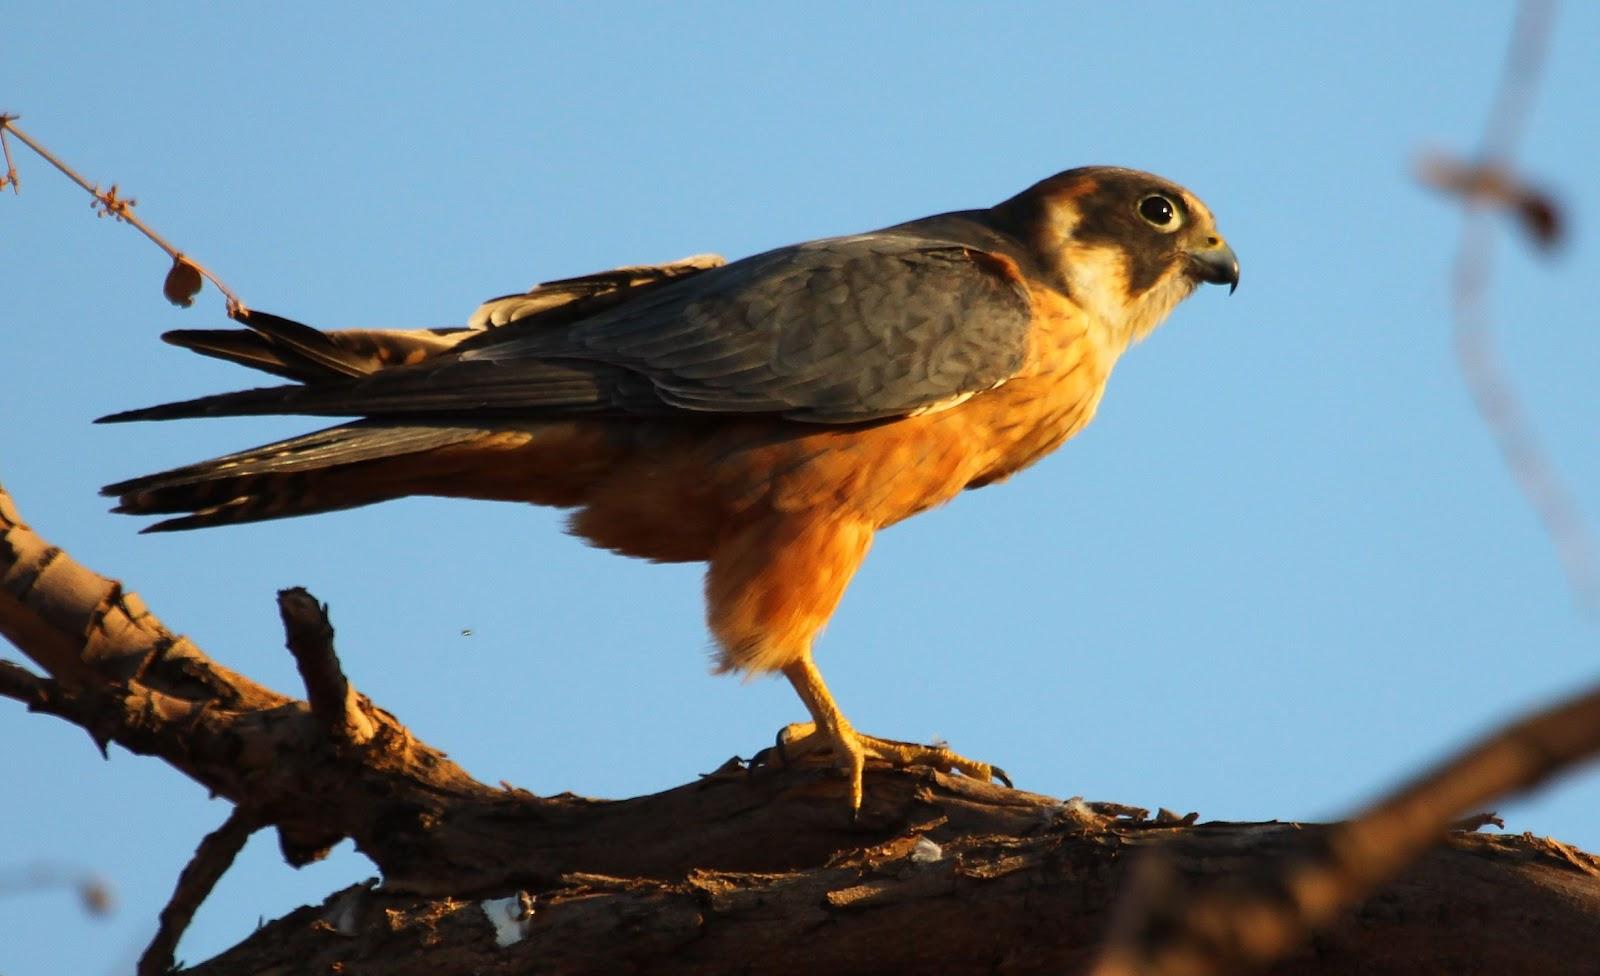 Australian miner bird photos Birds Archive - Canberra Birds